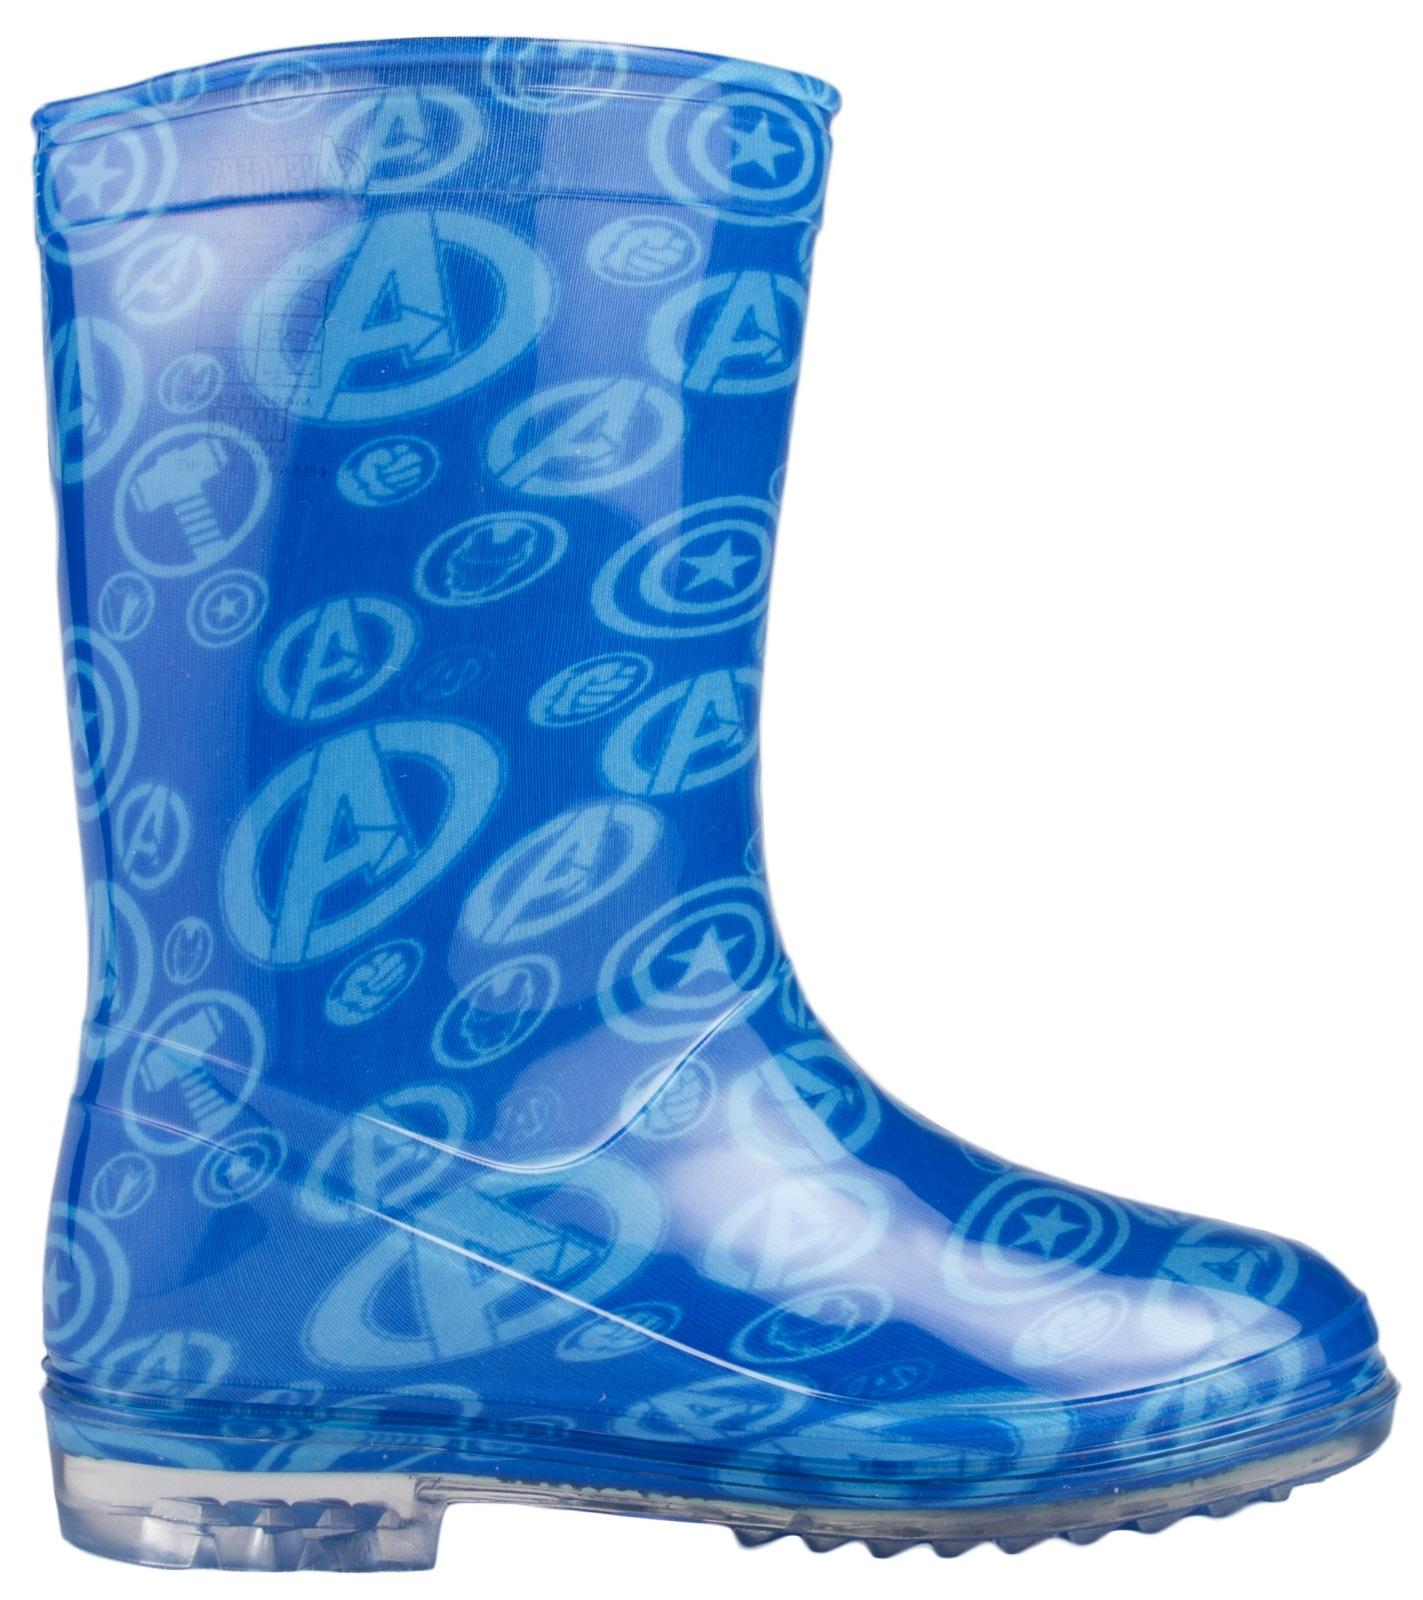 boys marvel wellington boots snow wellies